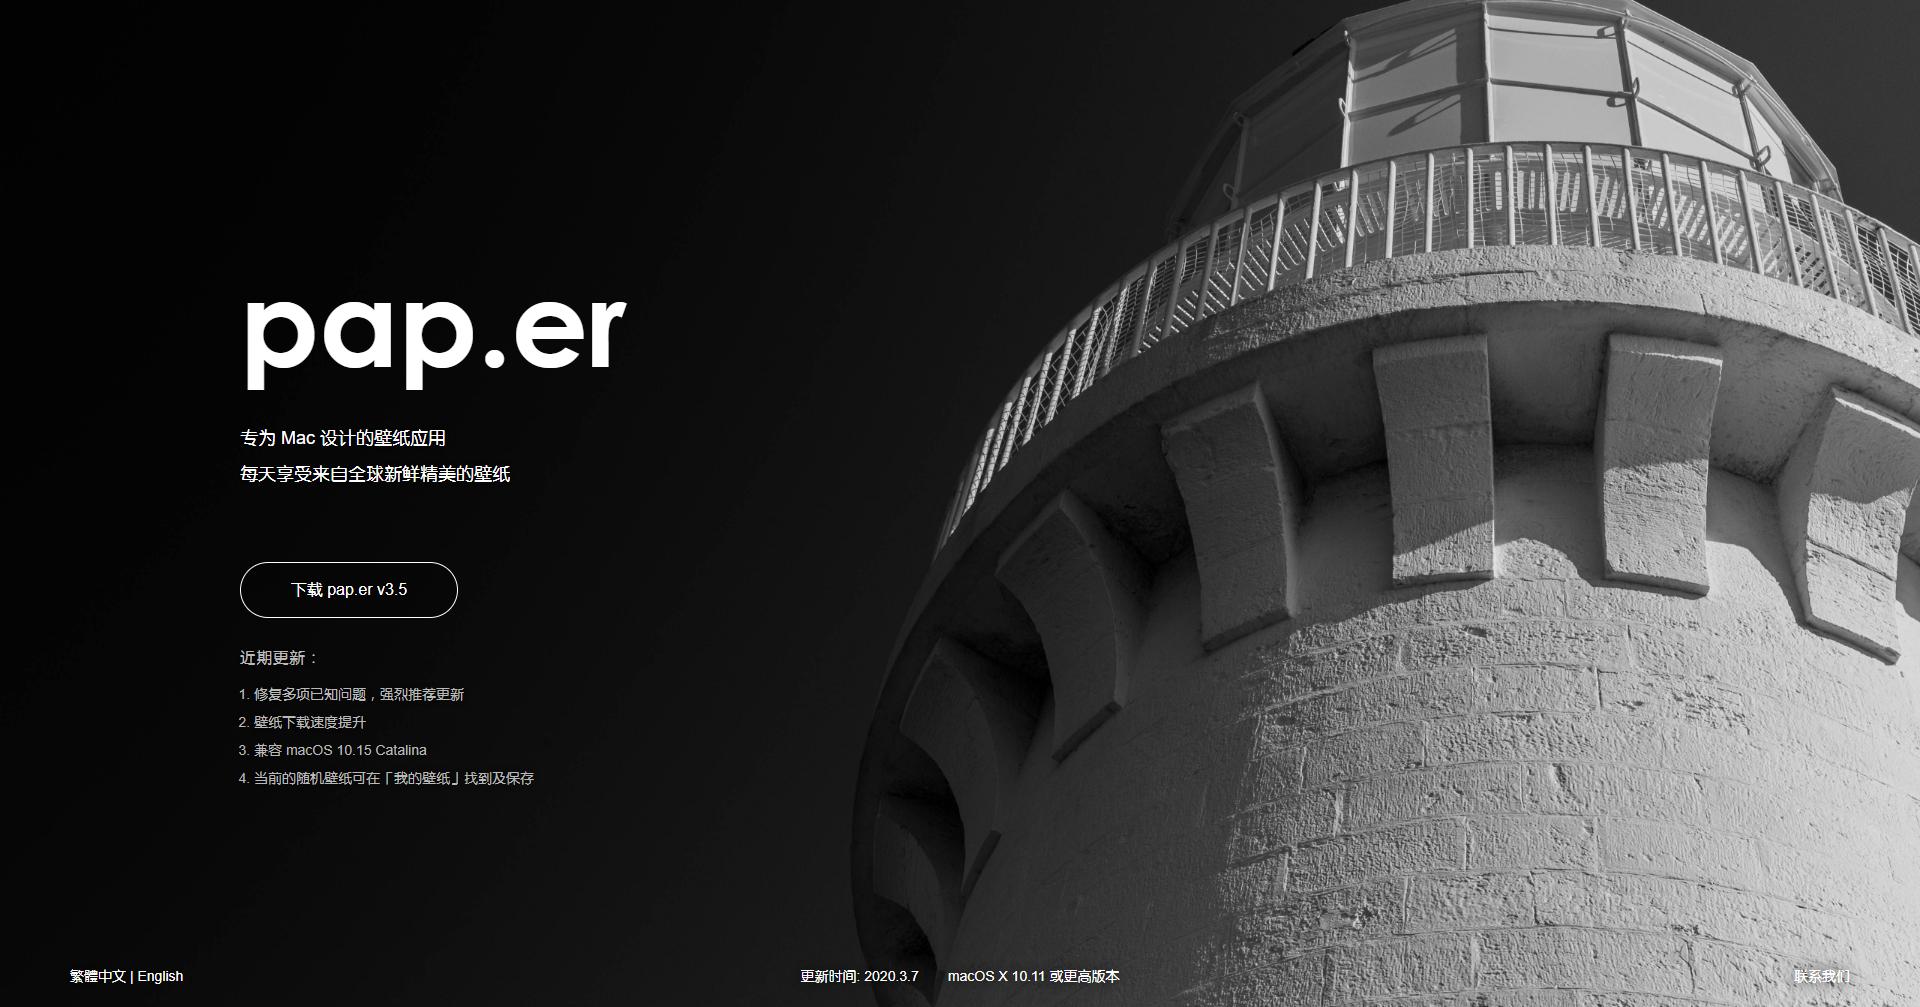 pap.er - 专为 Mac 设计的壁纸应用